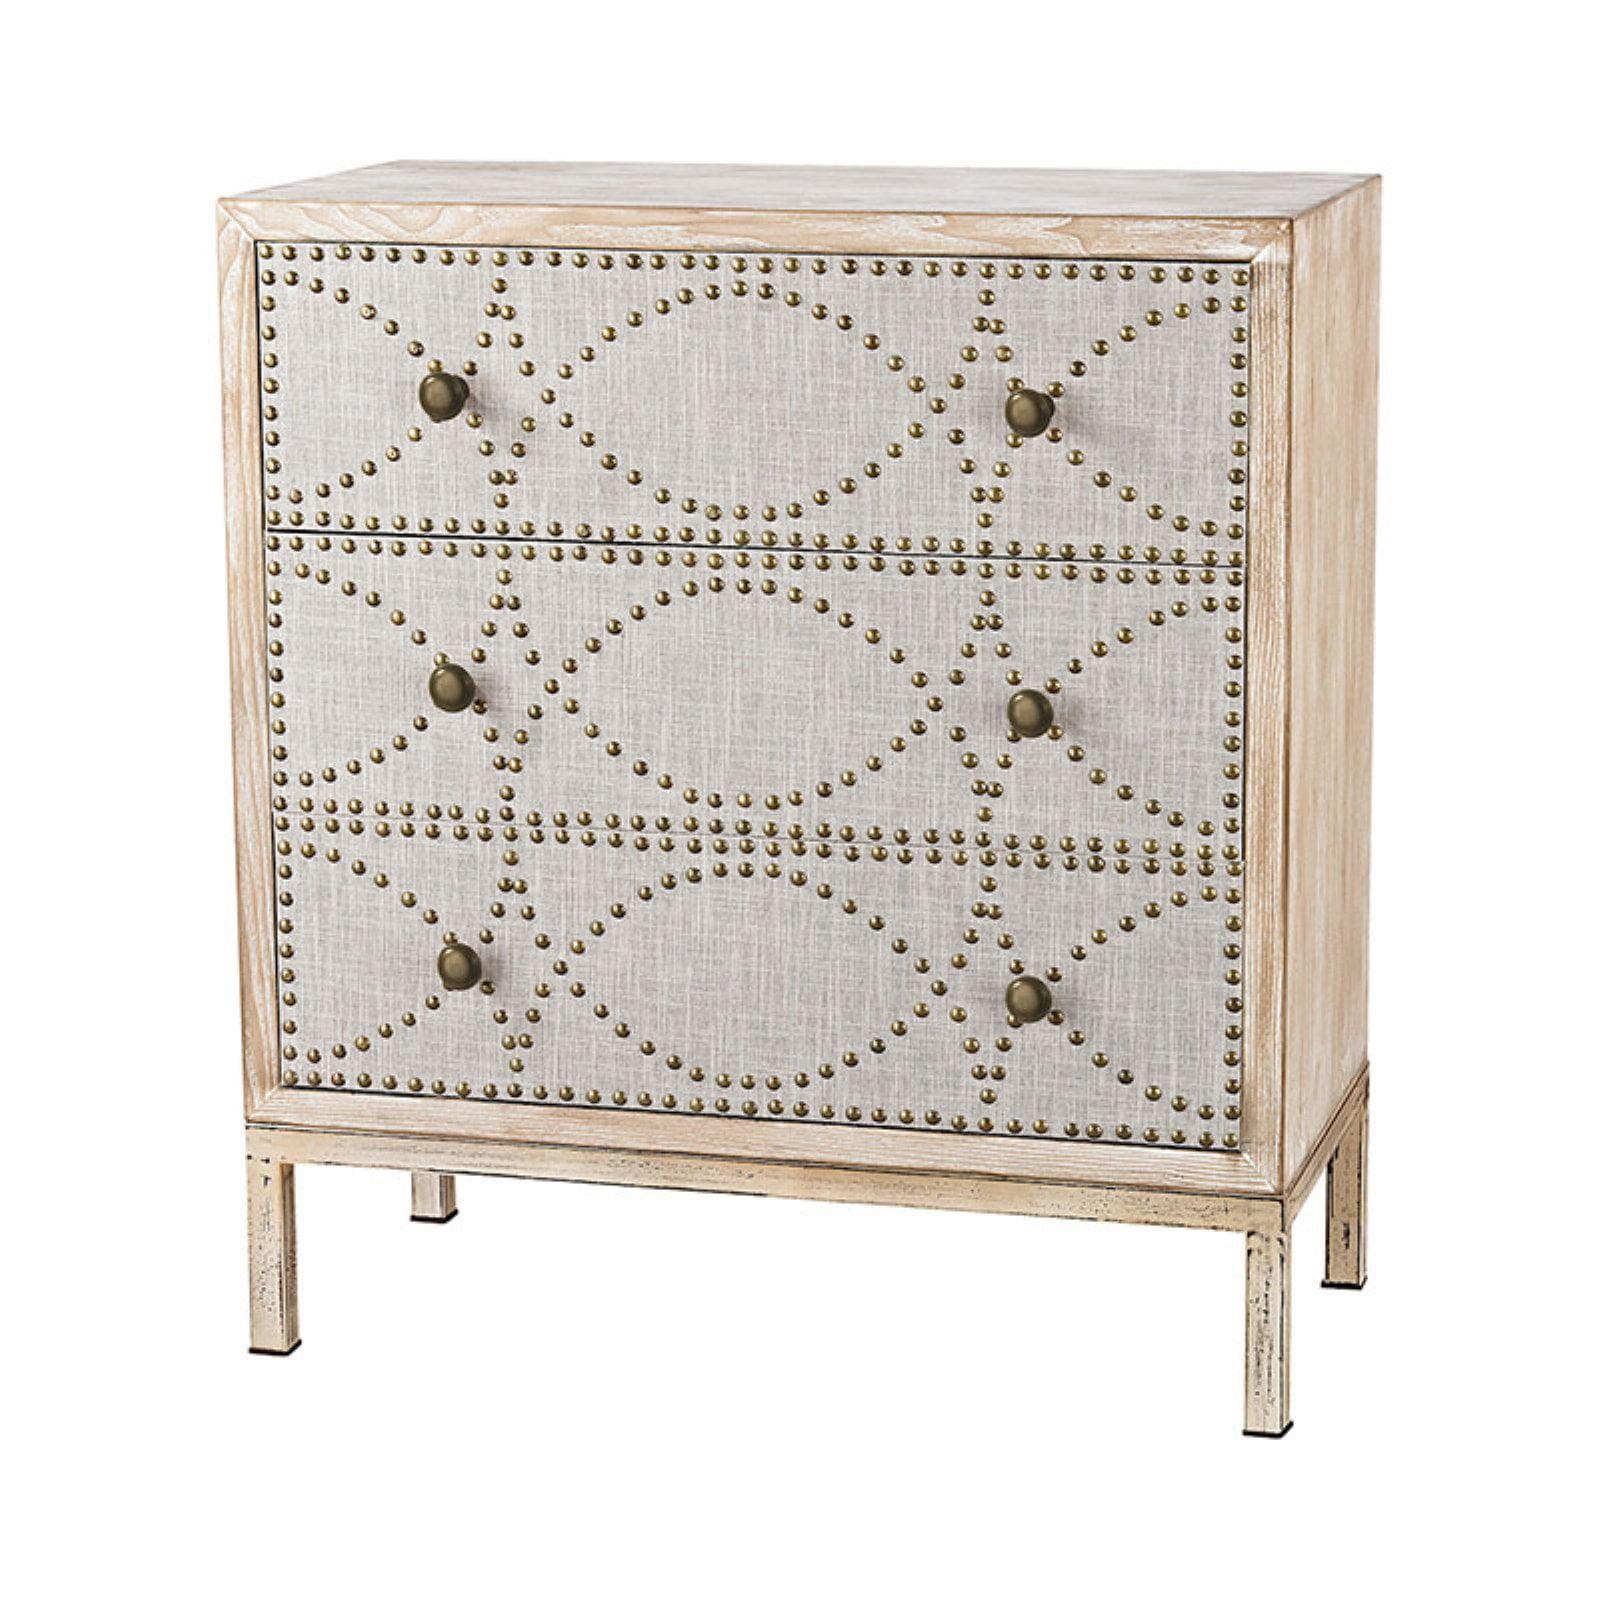 ELK Lighting Albiera 3 Drawer Cabinet by Sterling